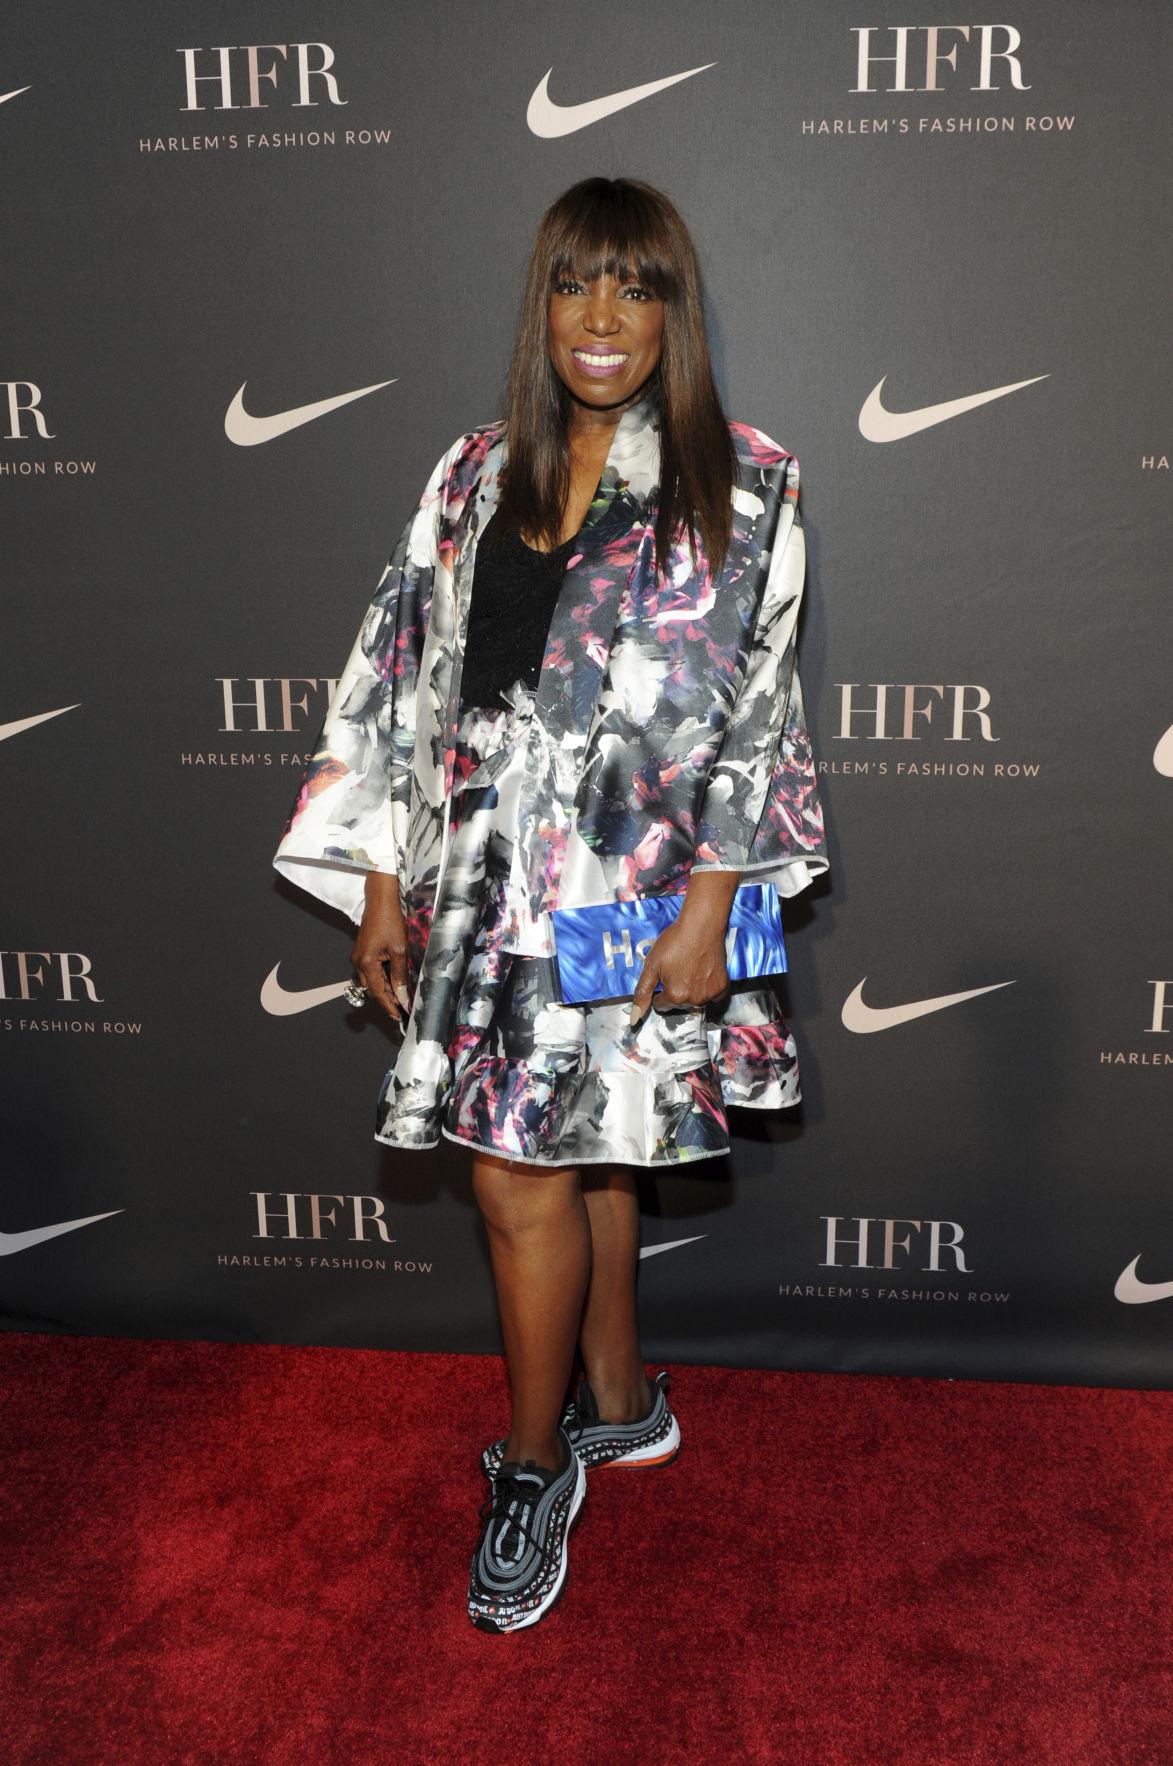 buy popular 2cc61 9fc47 Photos: LeBron James receives award from Harlem's Fashion ...